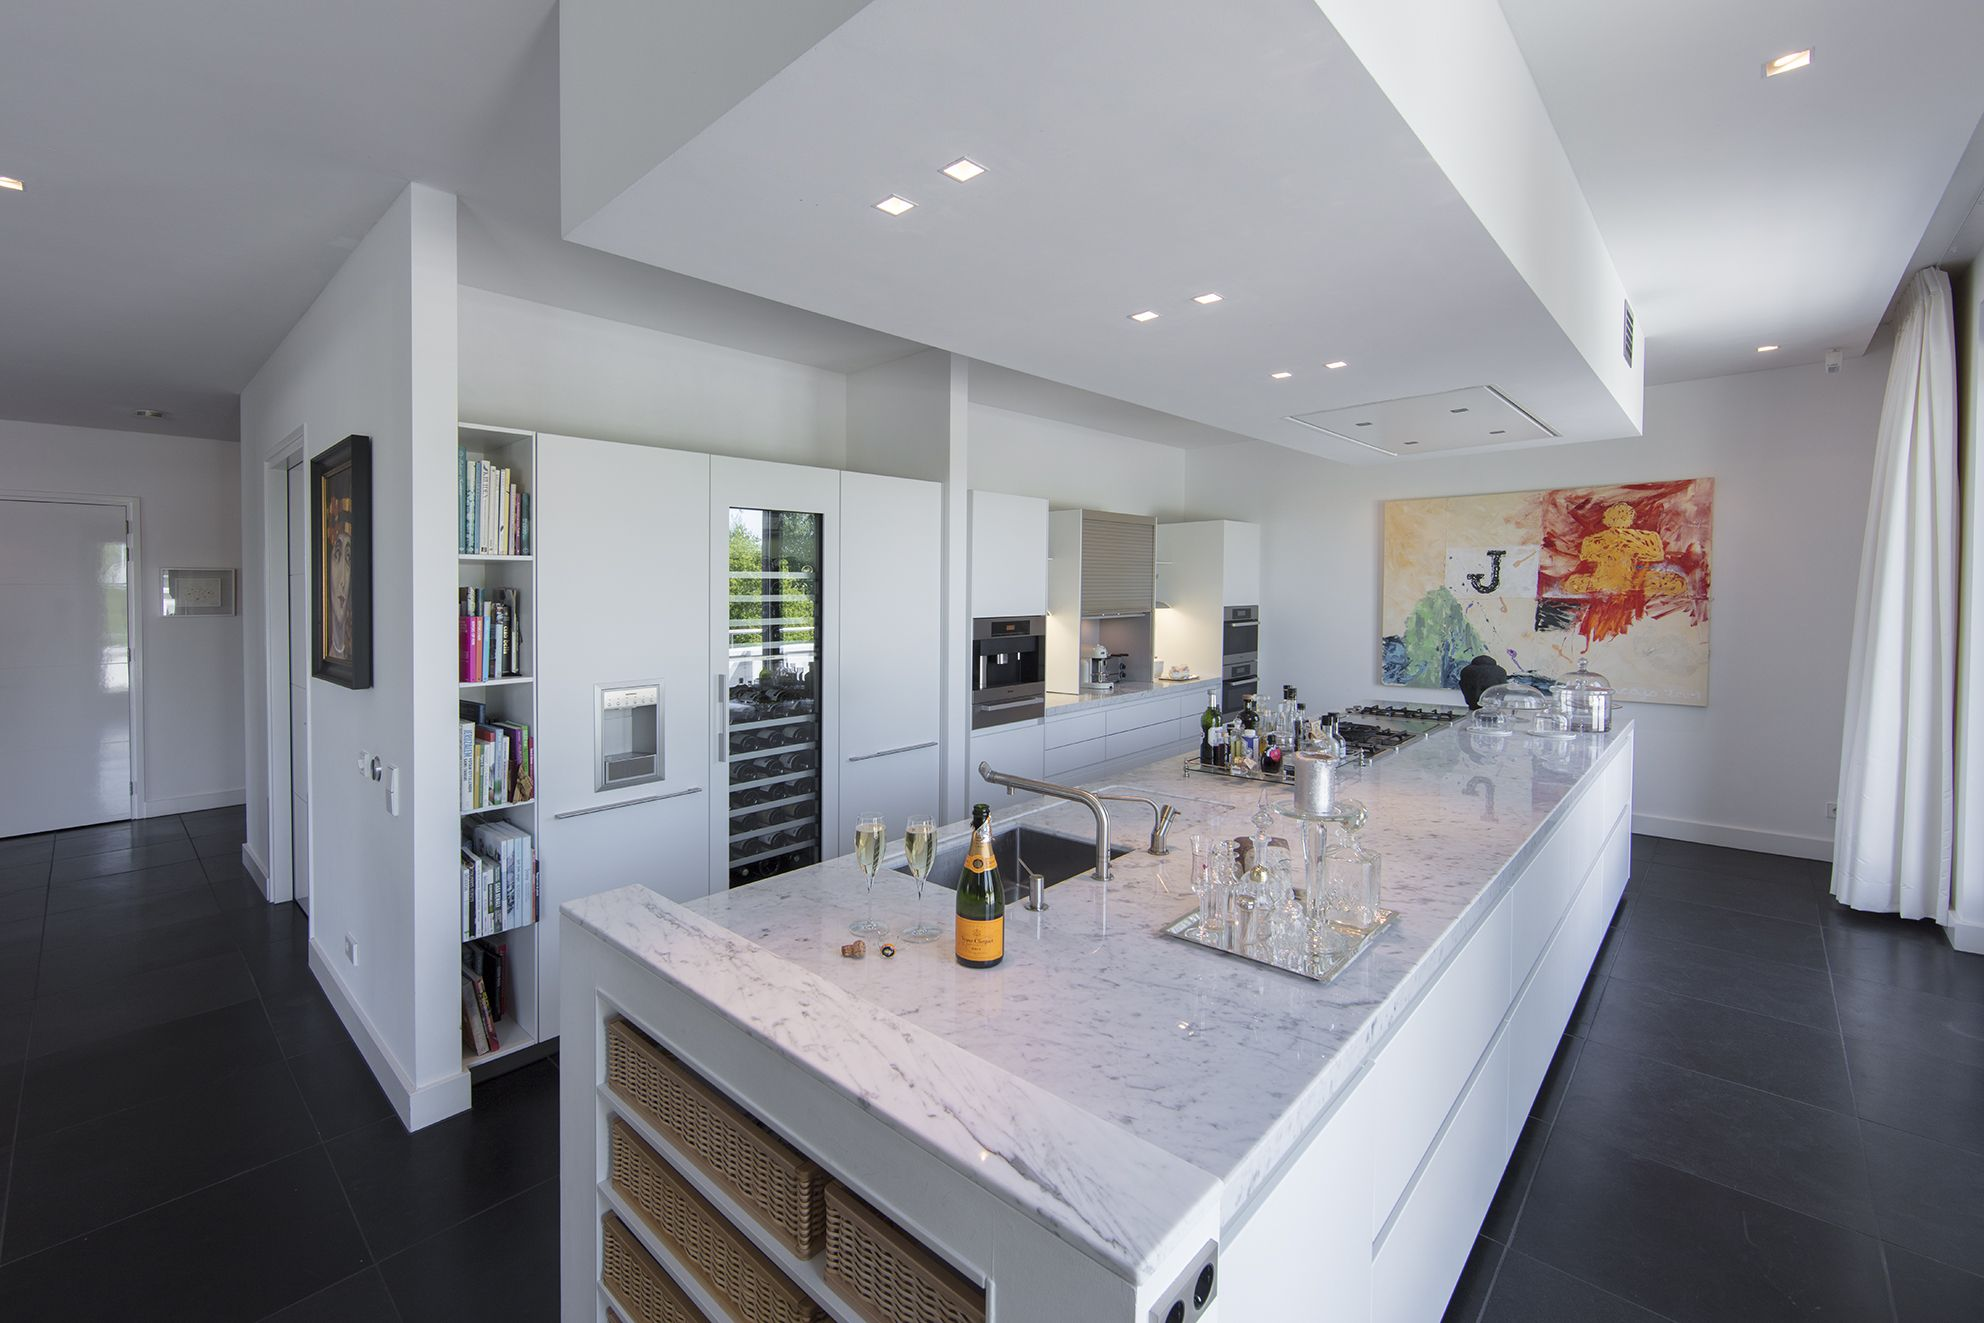 Penthouse Jan des Bouvrie ‹ Interieurfotograaf | Fotograaf |Michael ...